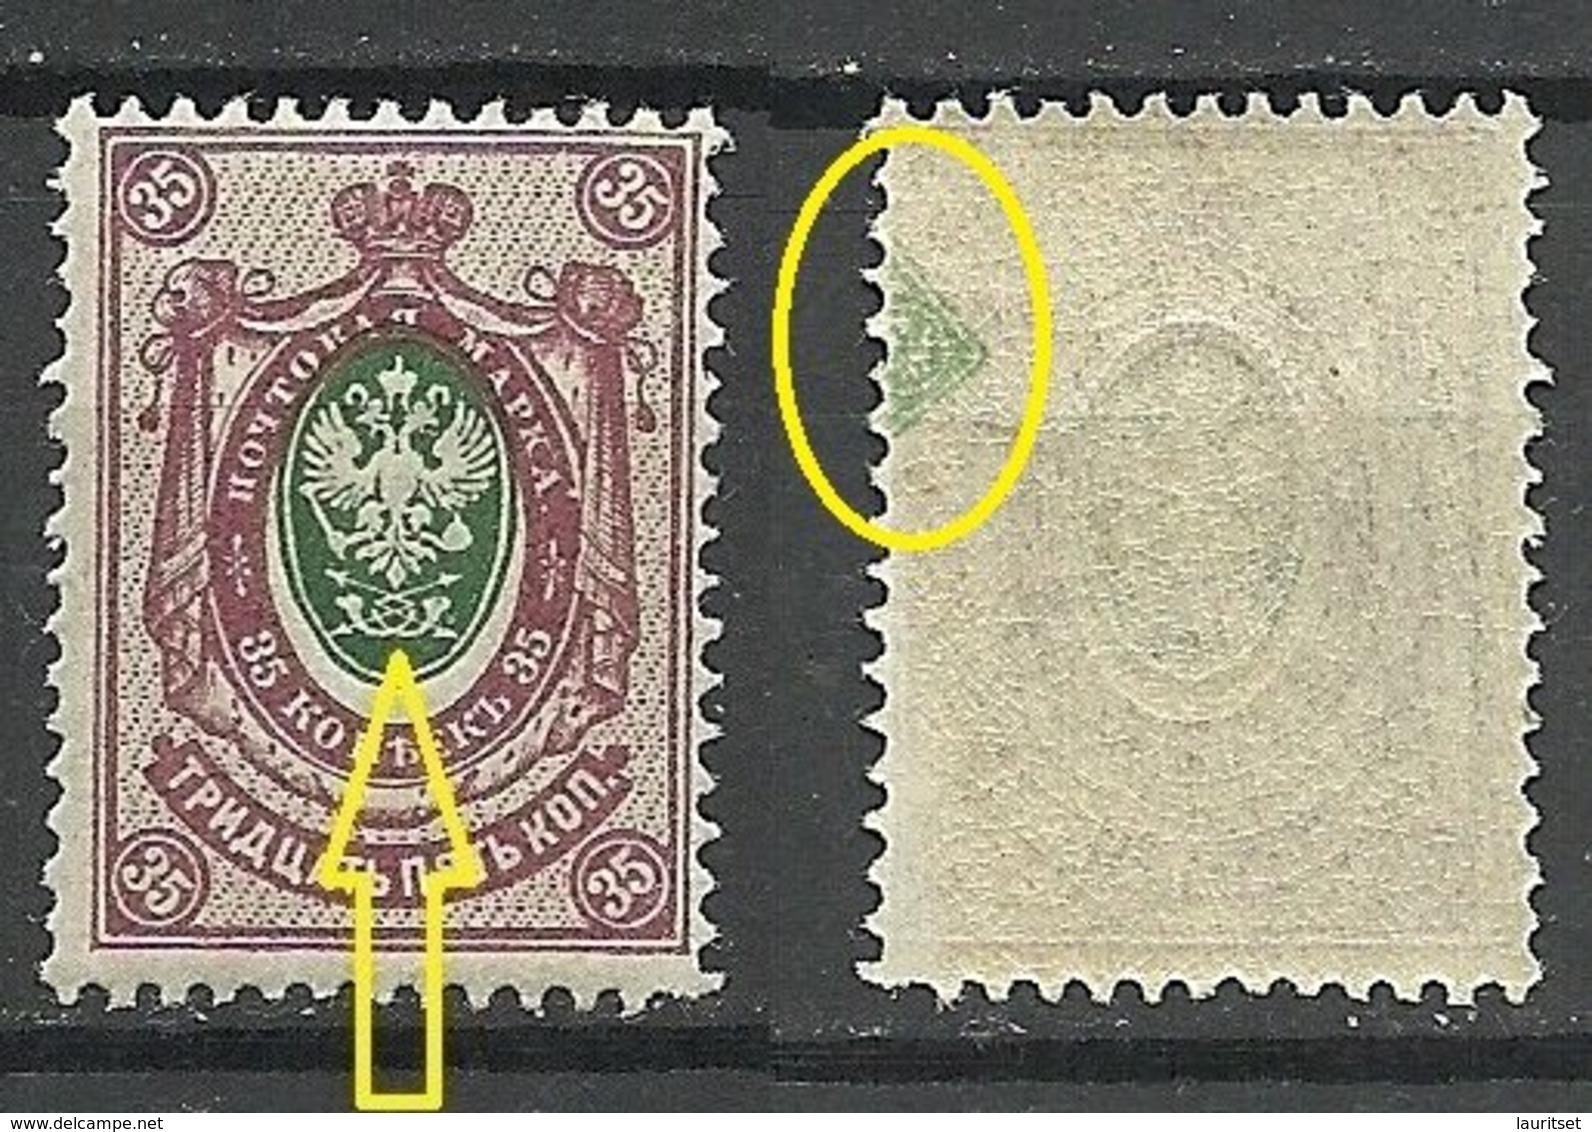 RUSSLAND RUSSIA 1912 Michel 74 A ERROR Abart Variety Shifted Center Print + Set Off MNH - 1857-1916 Empire